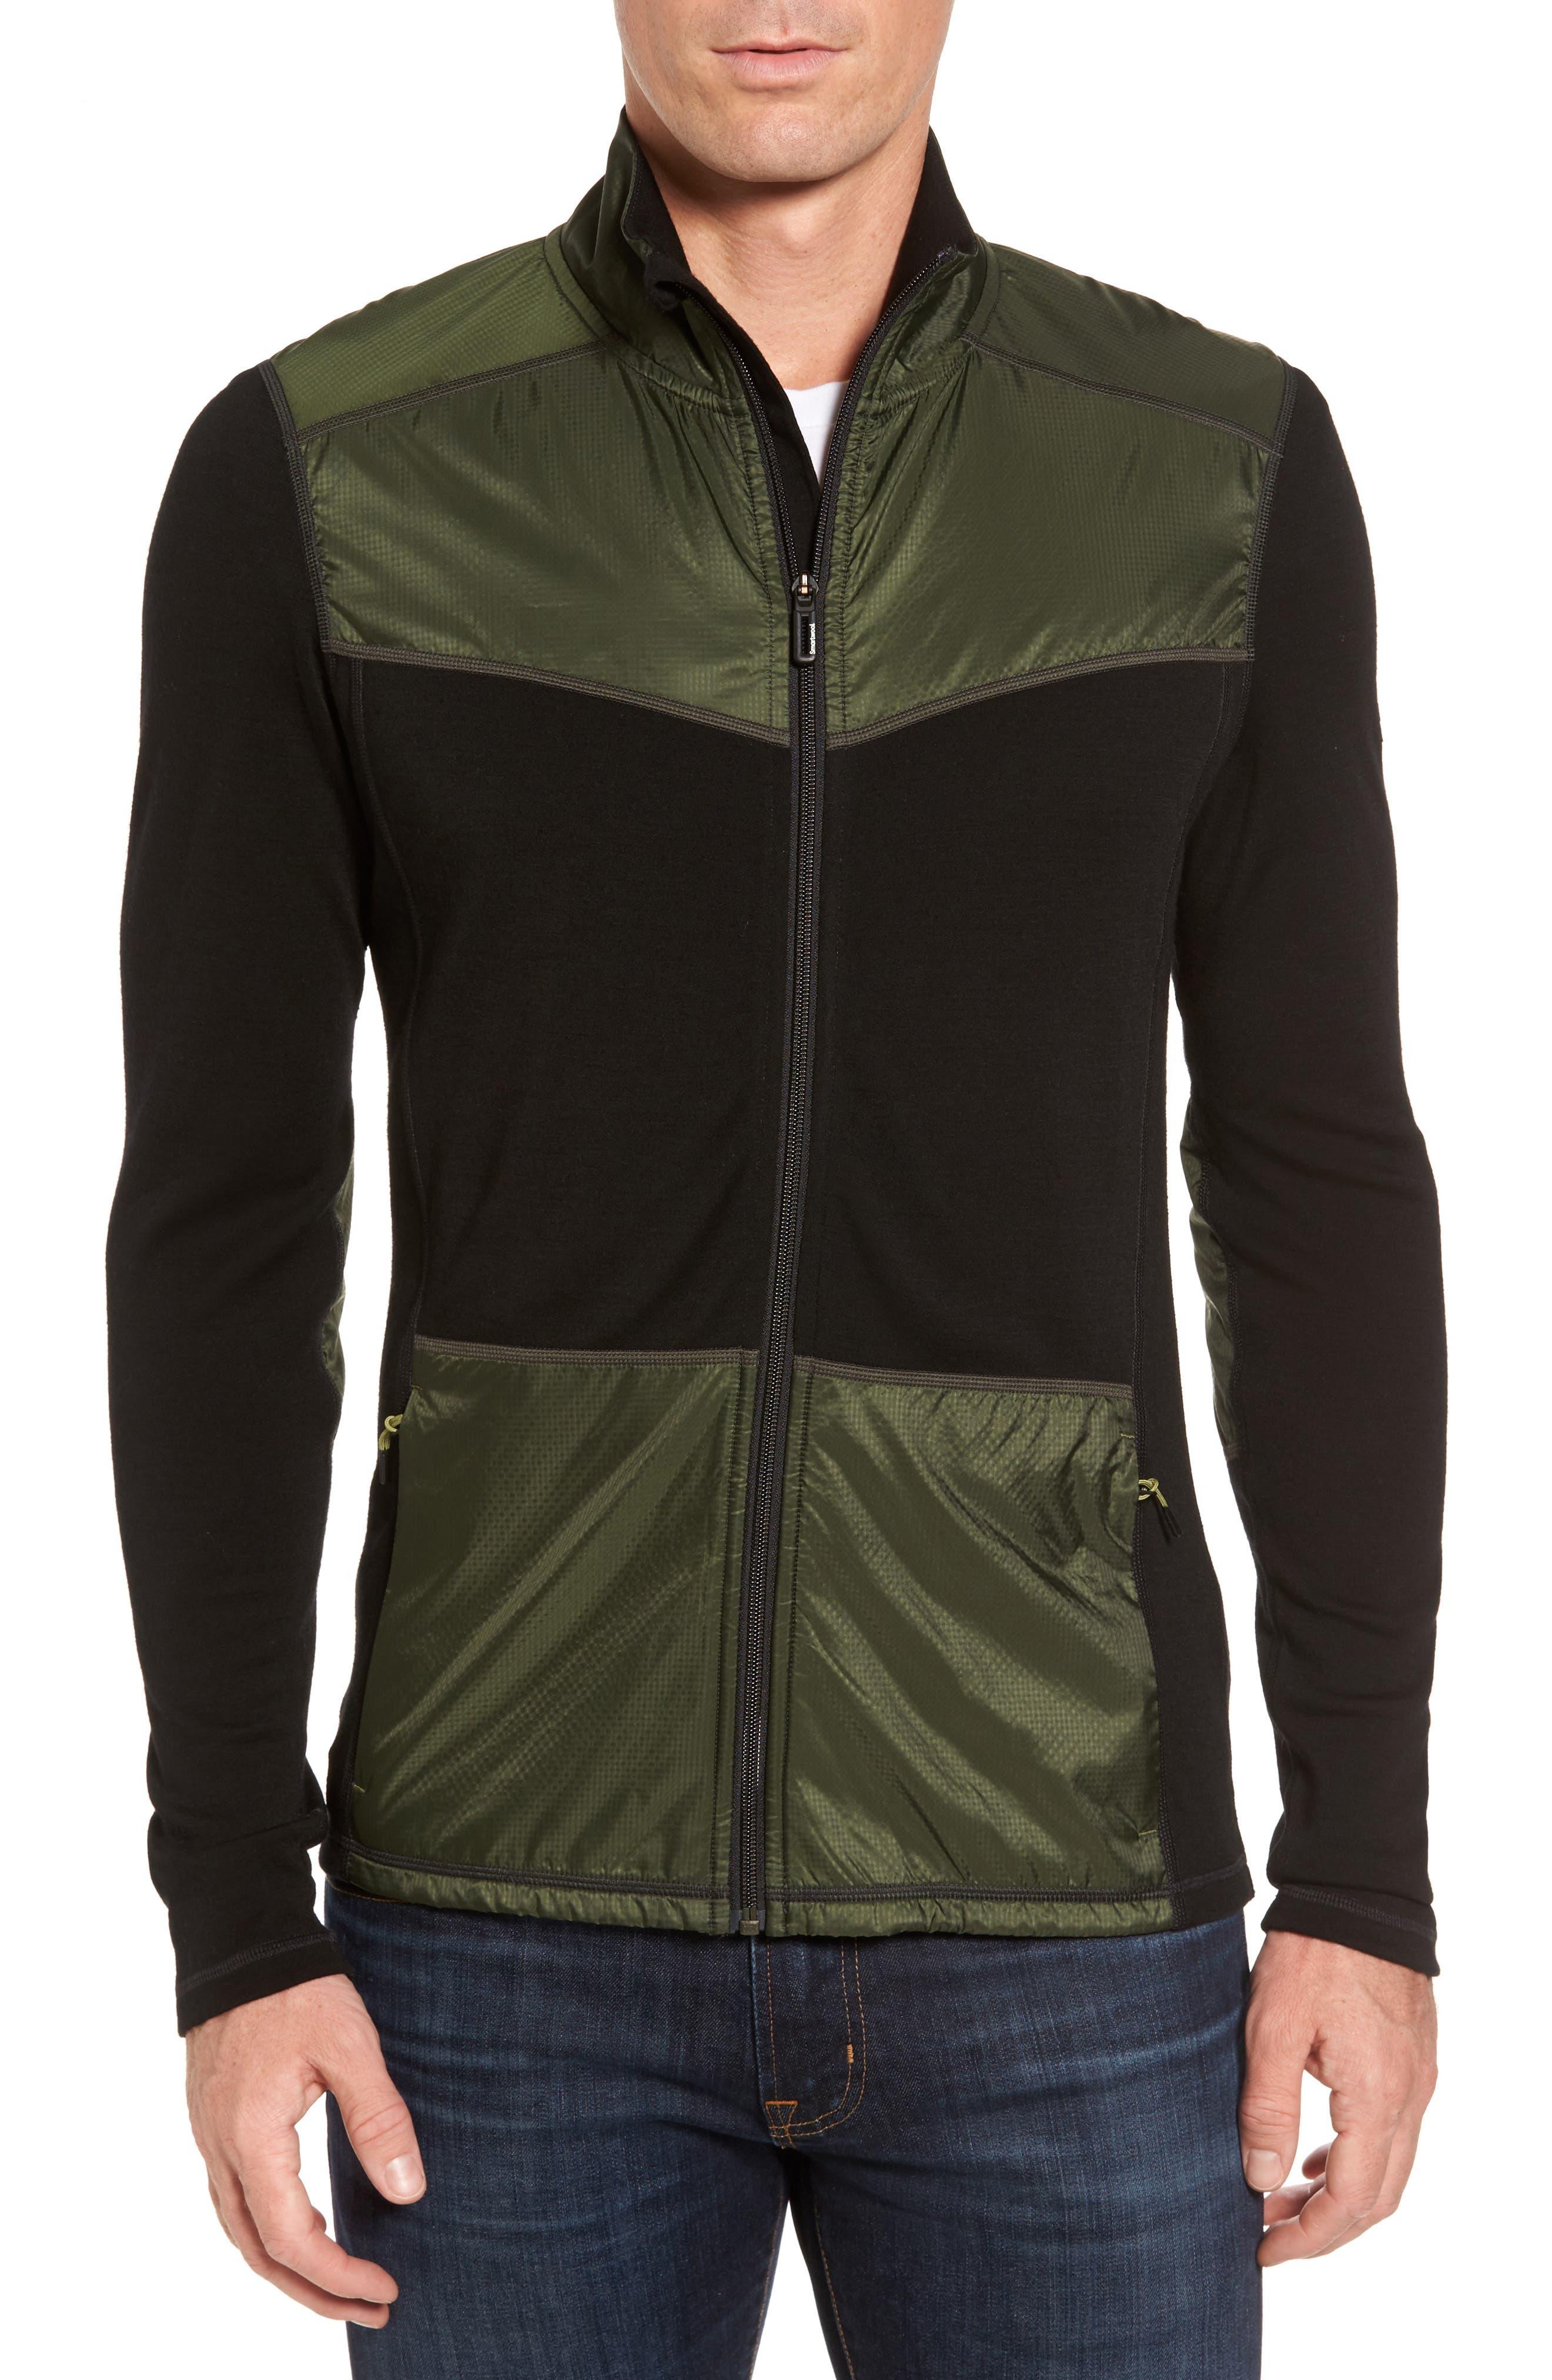 Main Image - SmartWool 250 Sport Merino Wool Zip Jacket